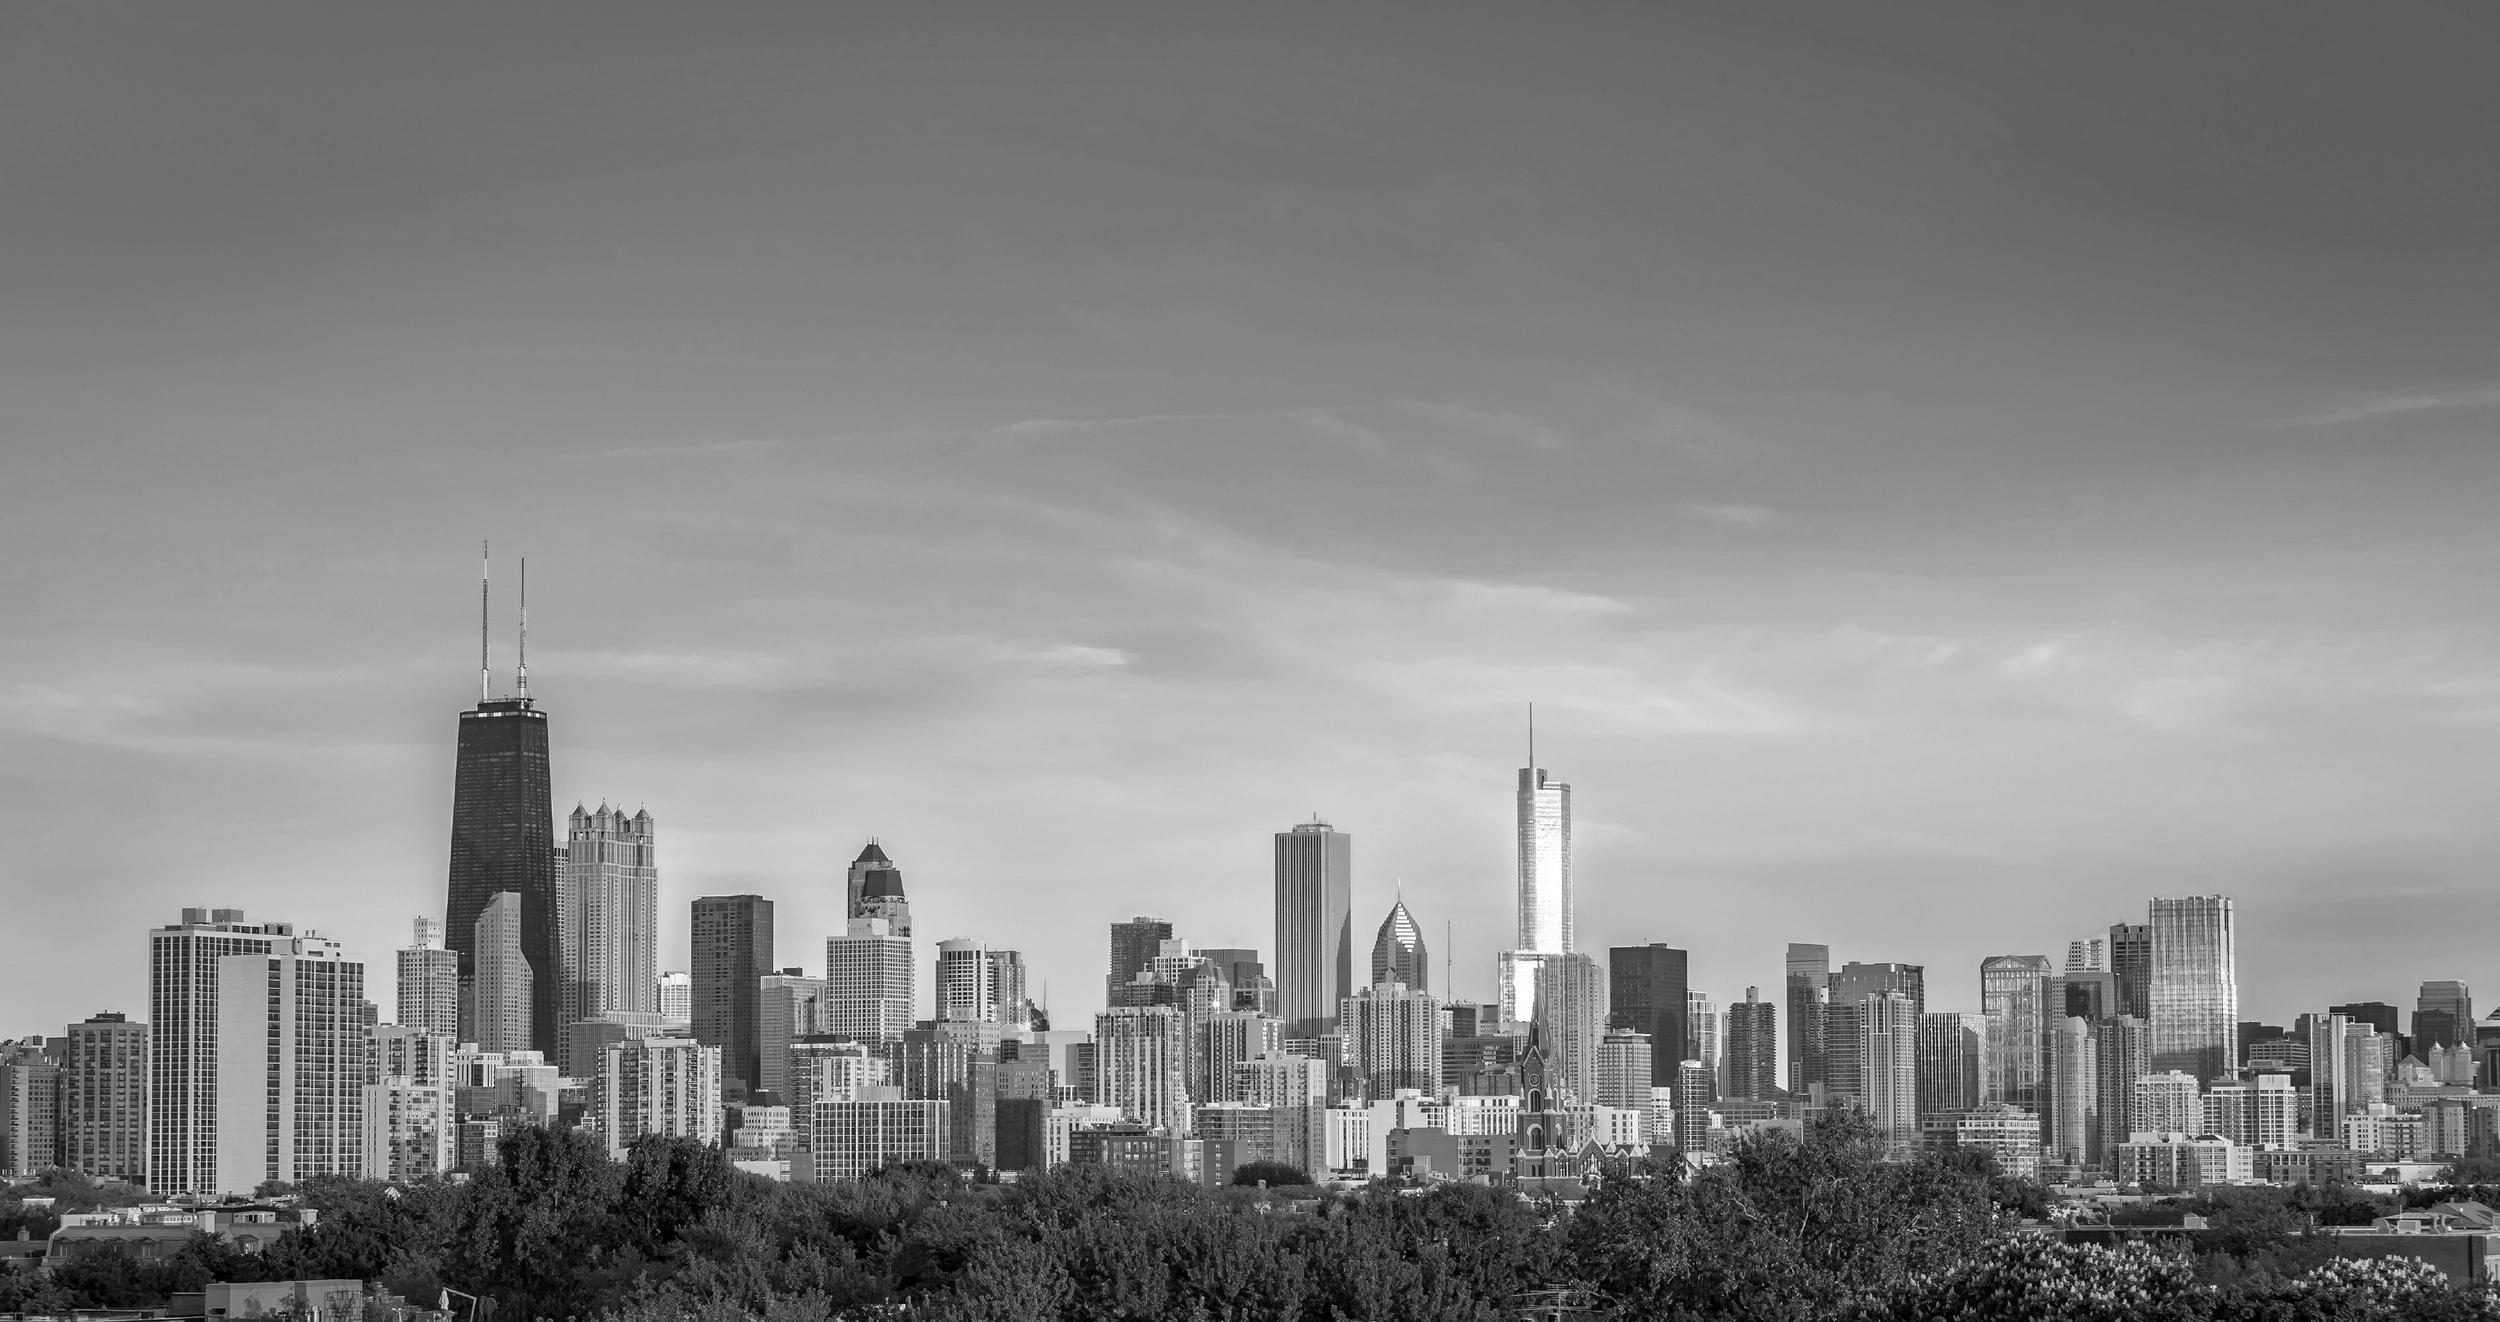 chicagosky.jpg